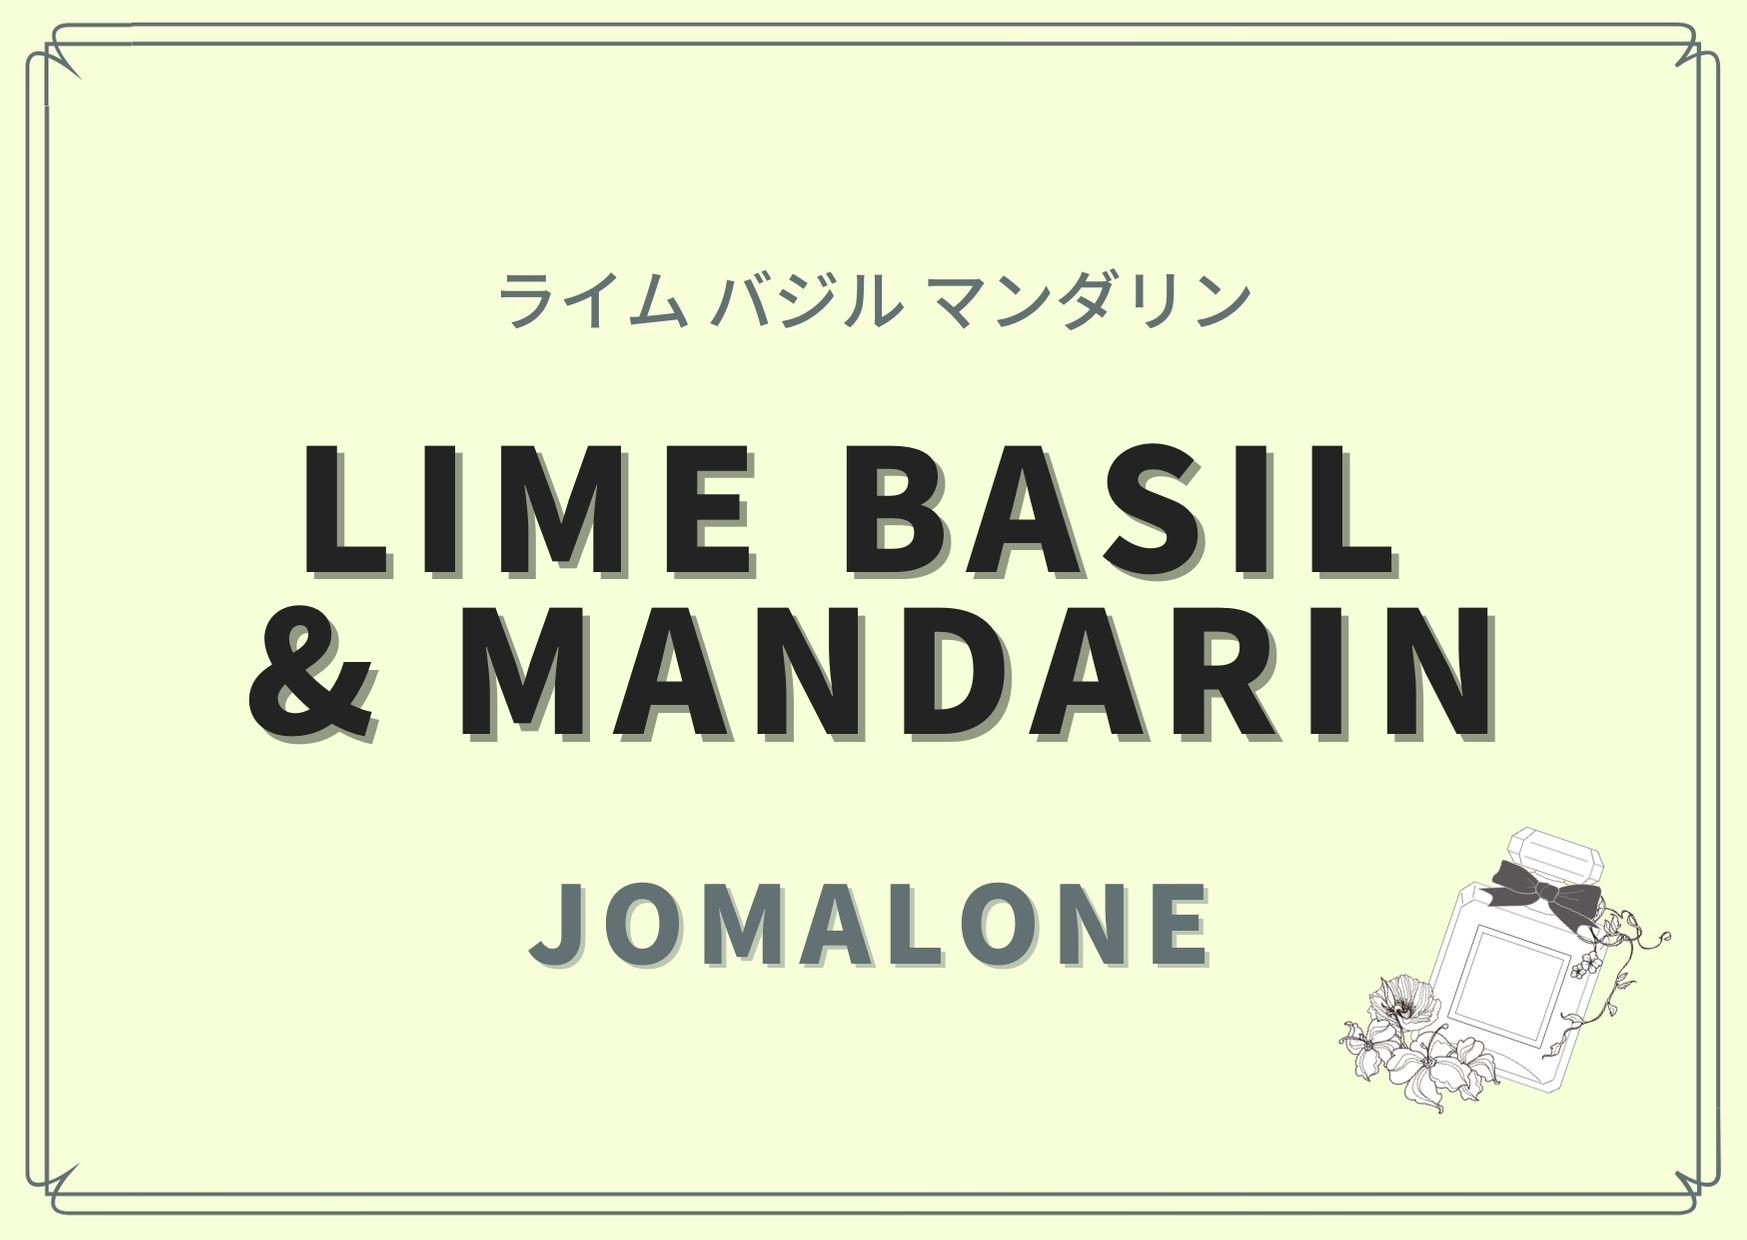 Lime Basil & Mandarin(ライムバジルマンダリン)/JoMalone(ジョーマローン)